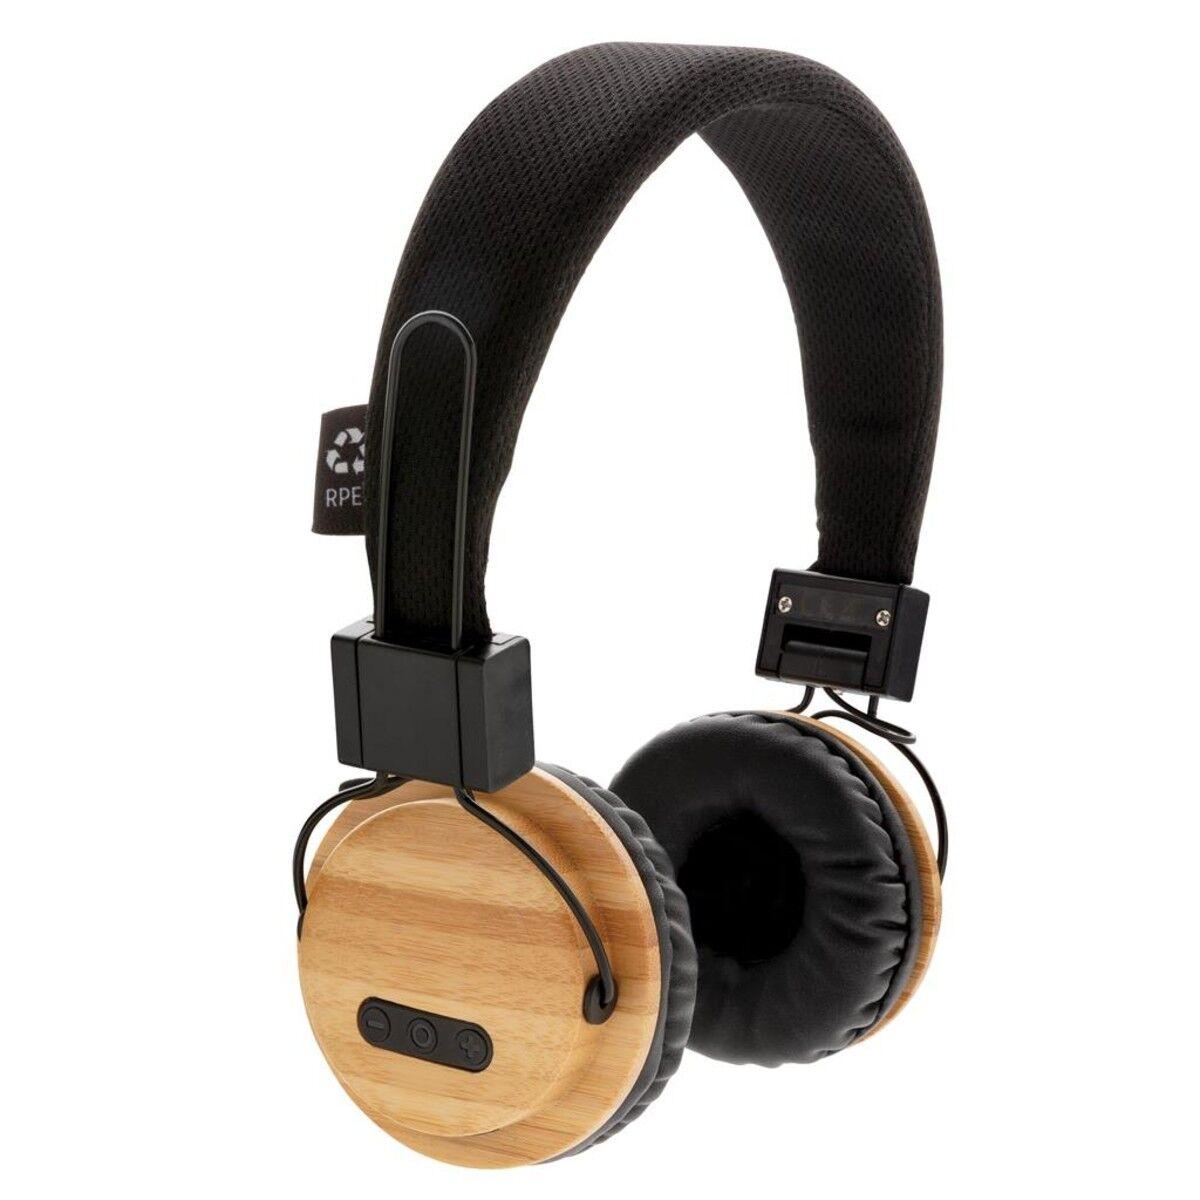 Wireless Bamboo Headphone